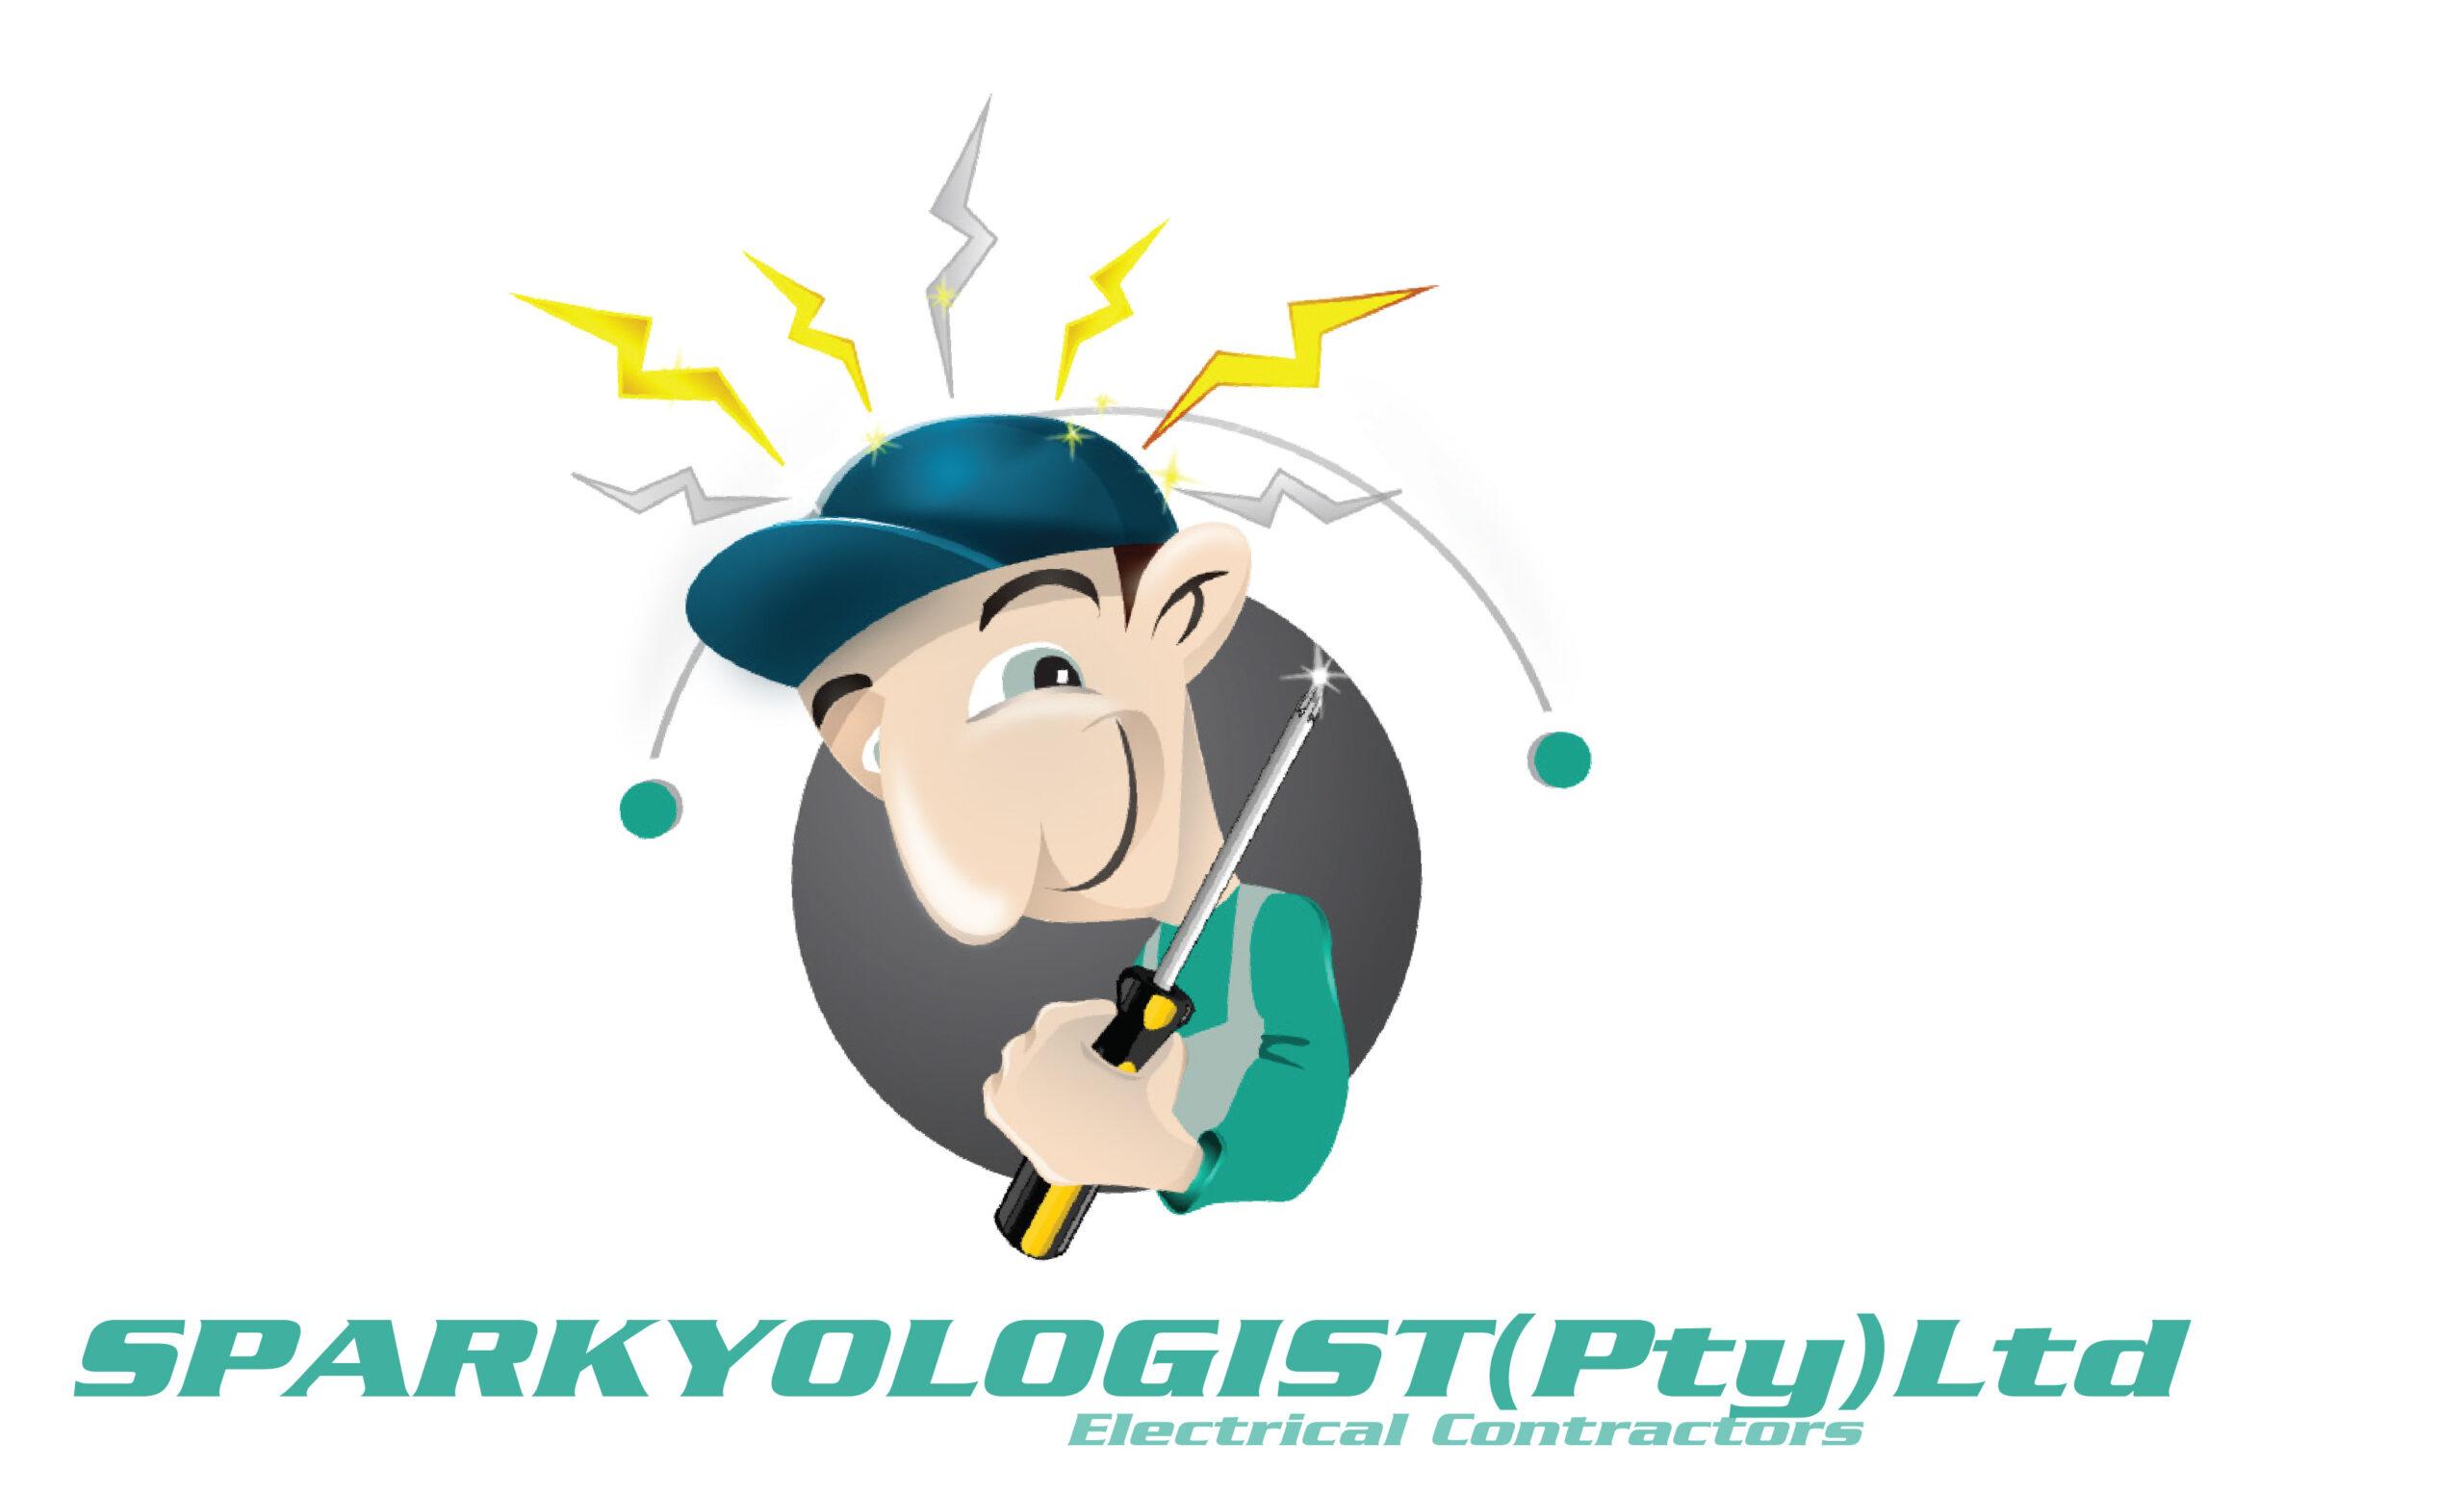 Sparkyologist